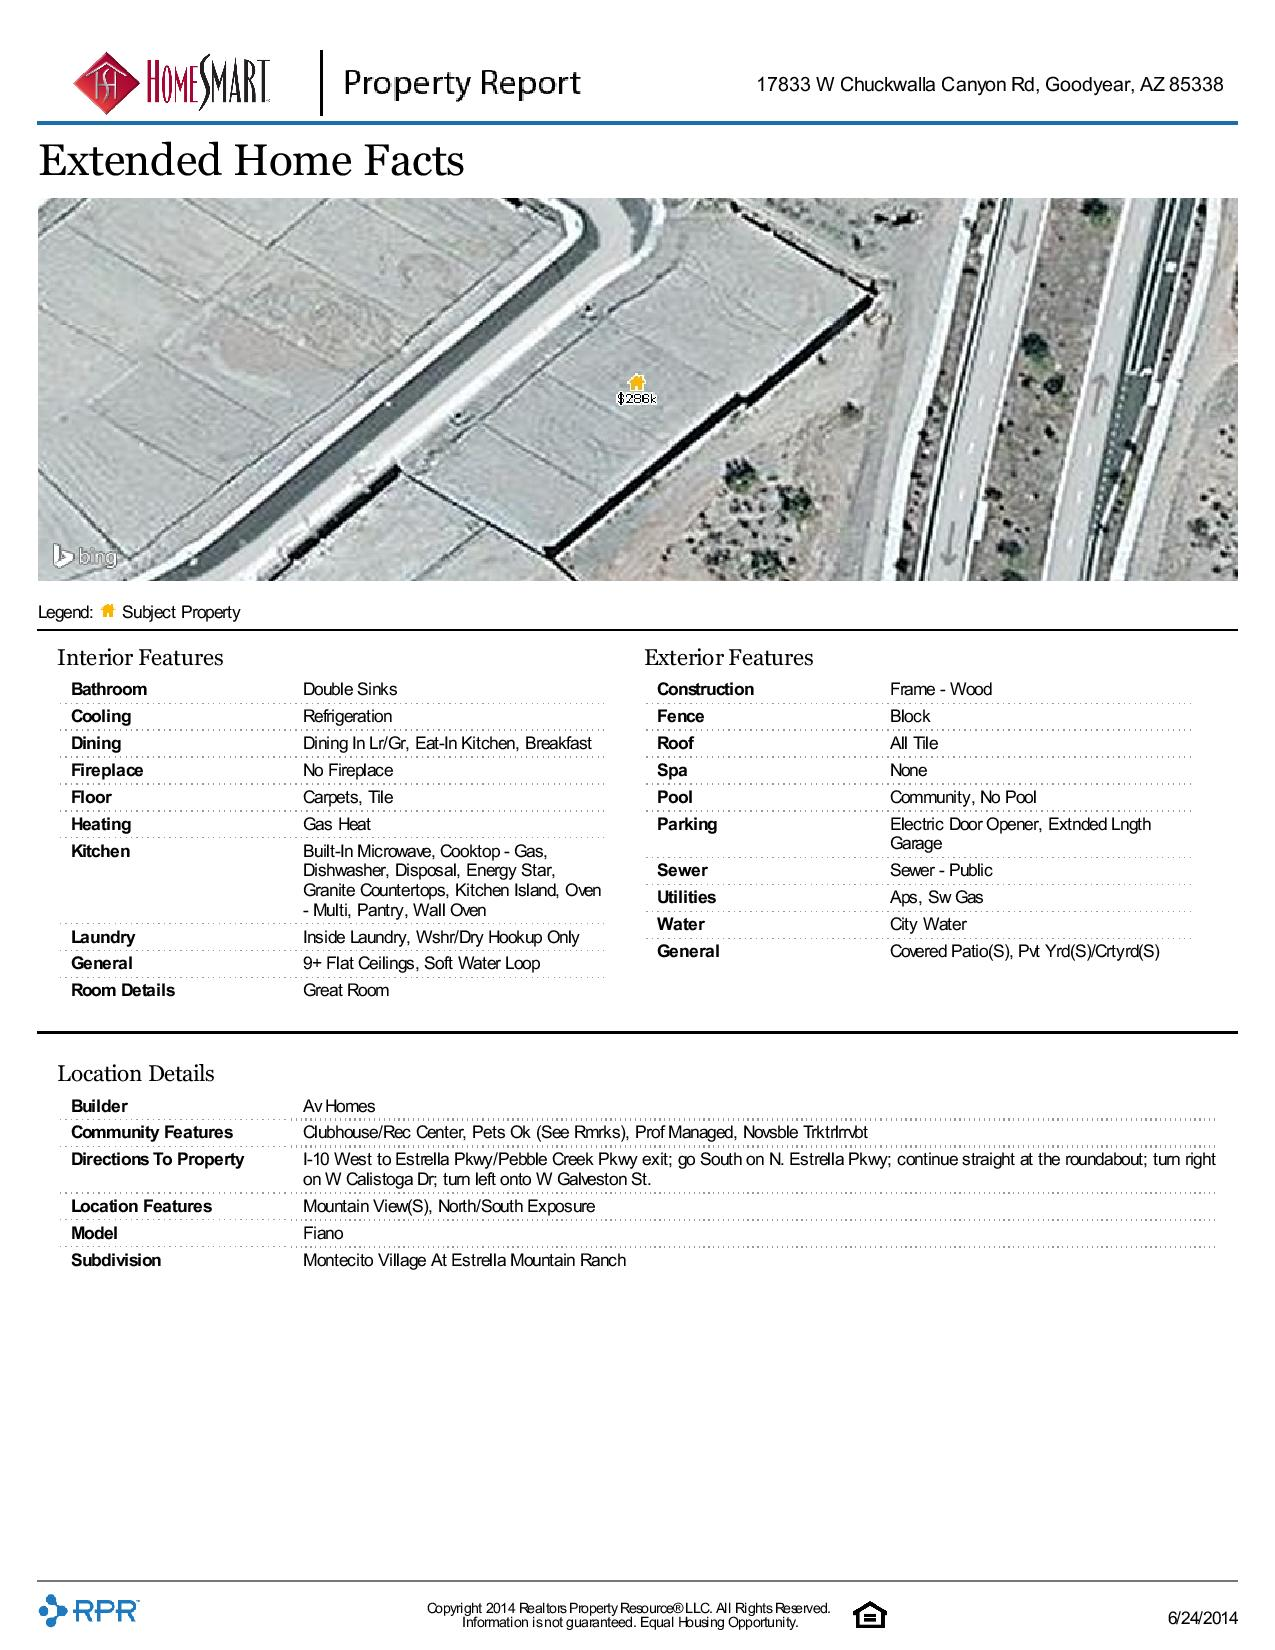 17833-W-Chuckwalla-Canyon-Rd-Goodyear-AZ-85338-page-004